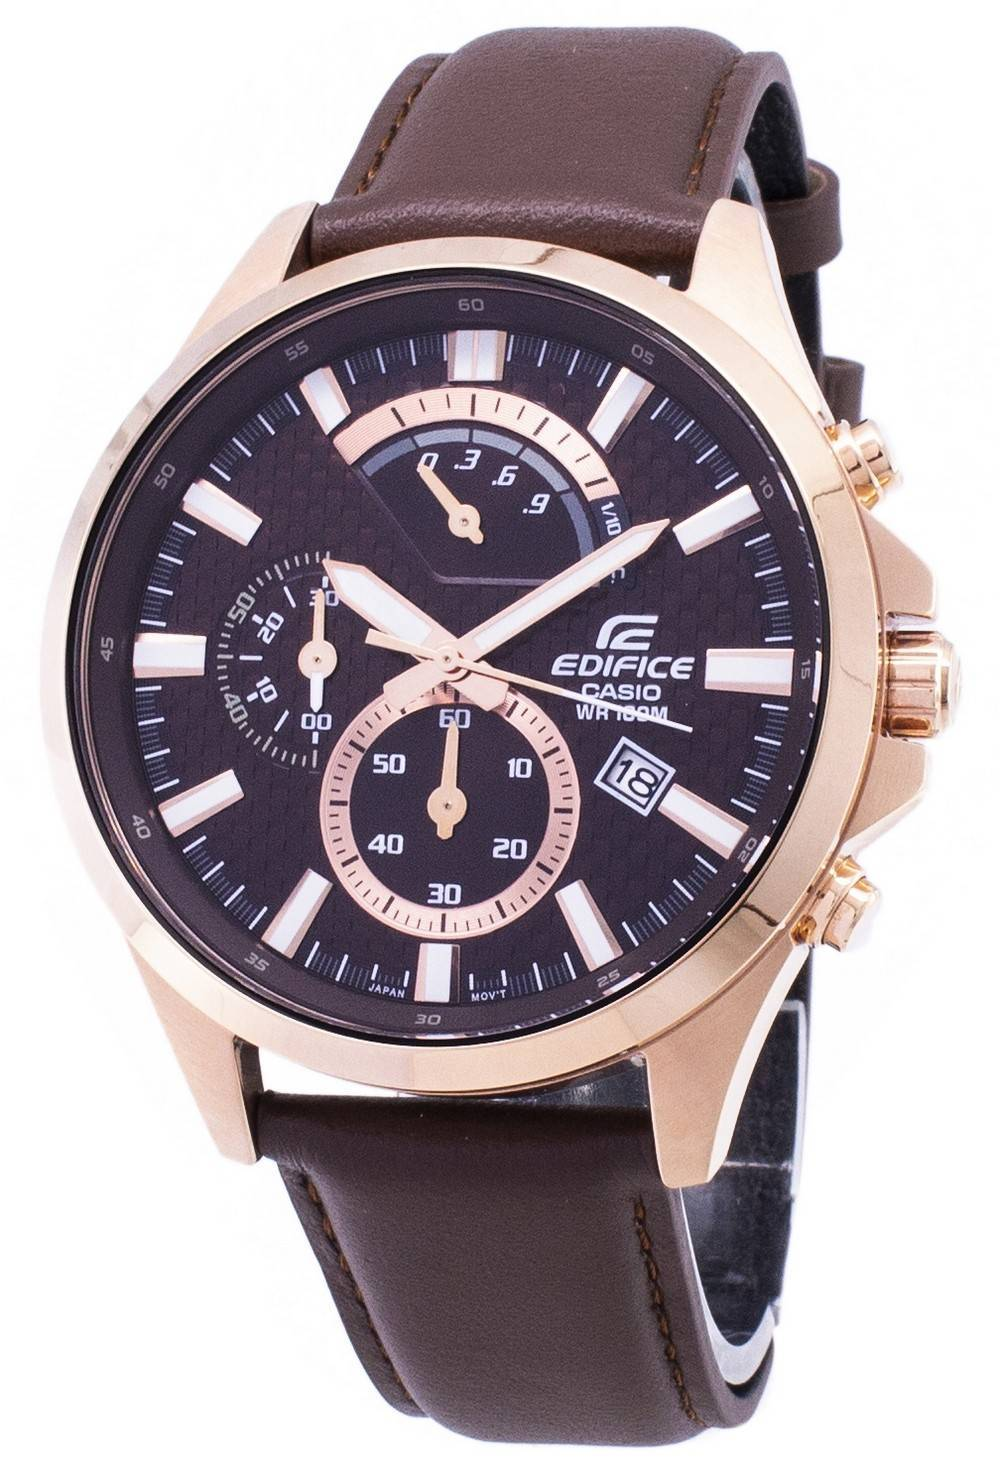 654c8d374448 Casio Edifice EFV-530GL-5AV Reloj cronógrafo de cuarzo para hombre ...